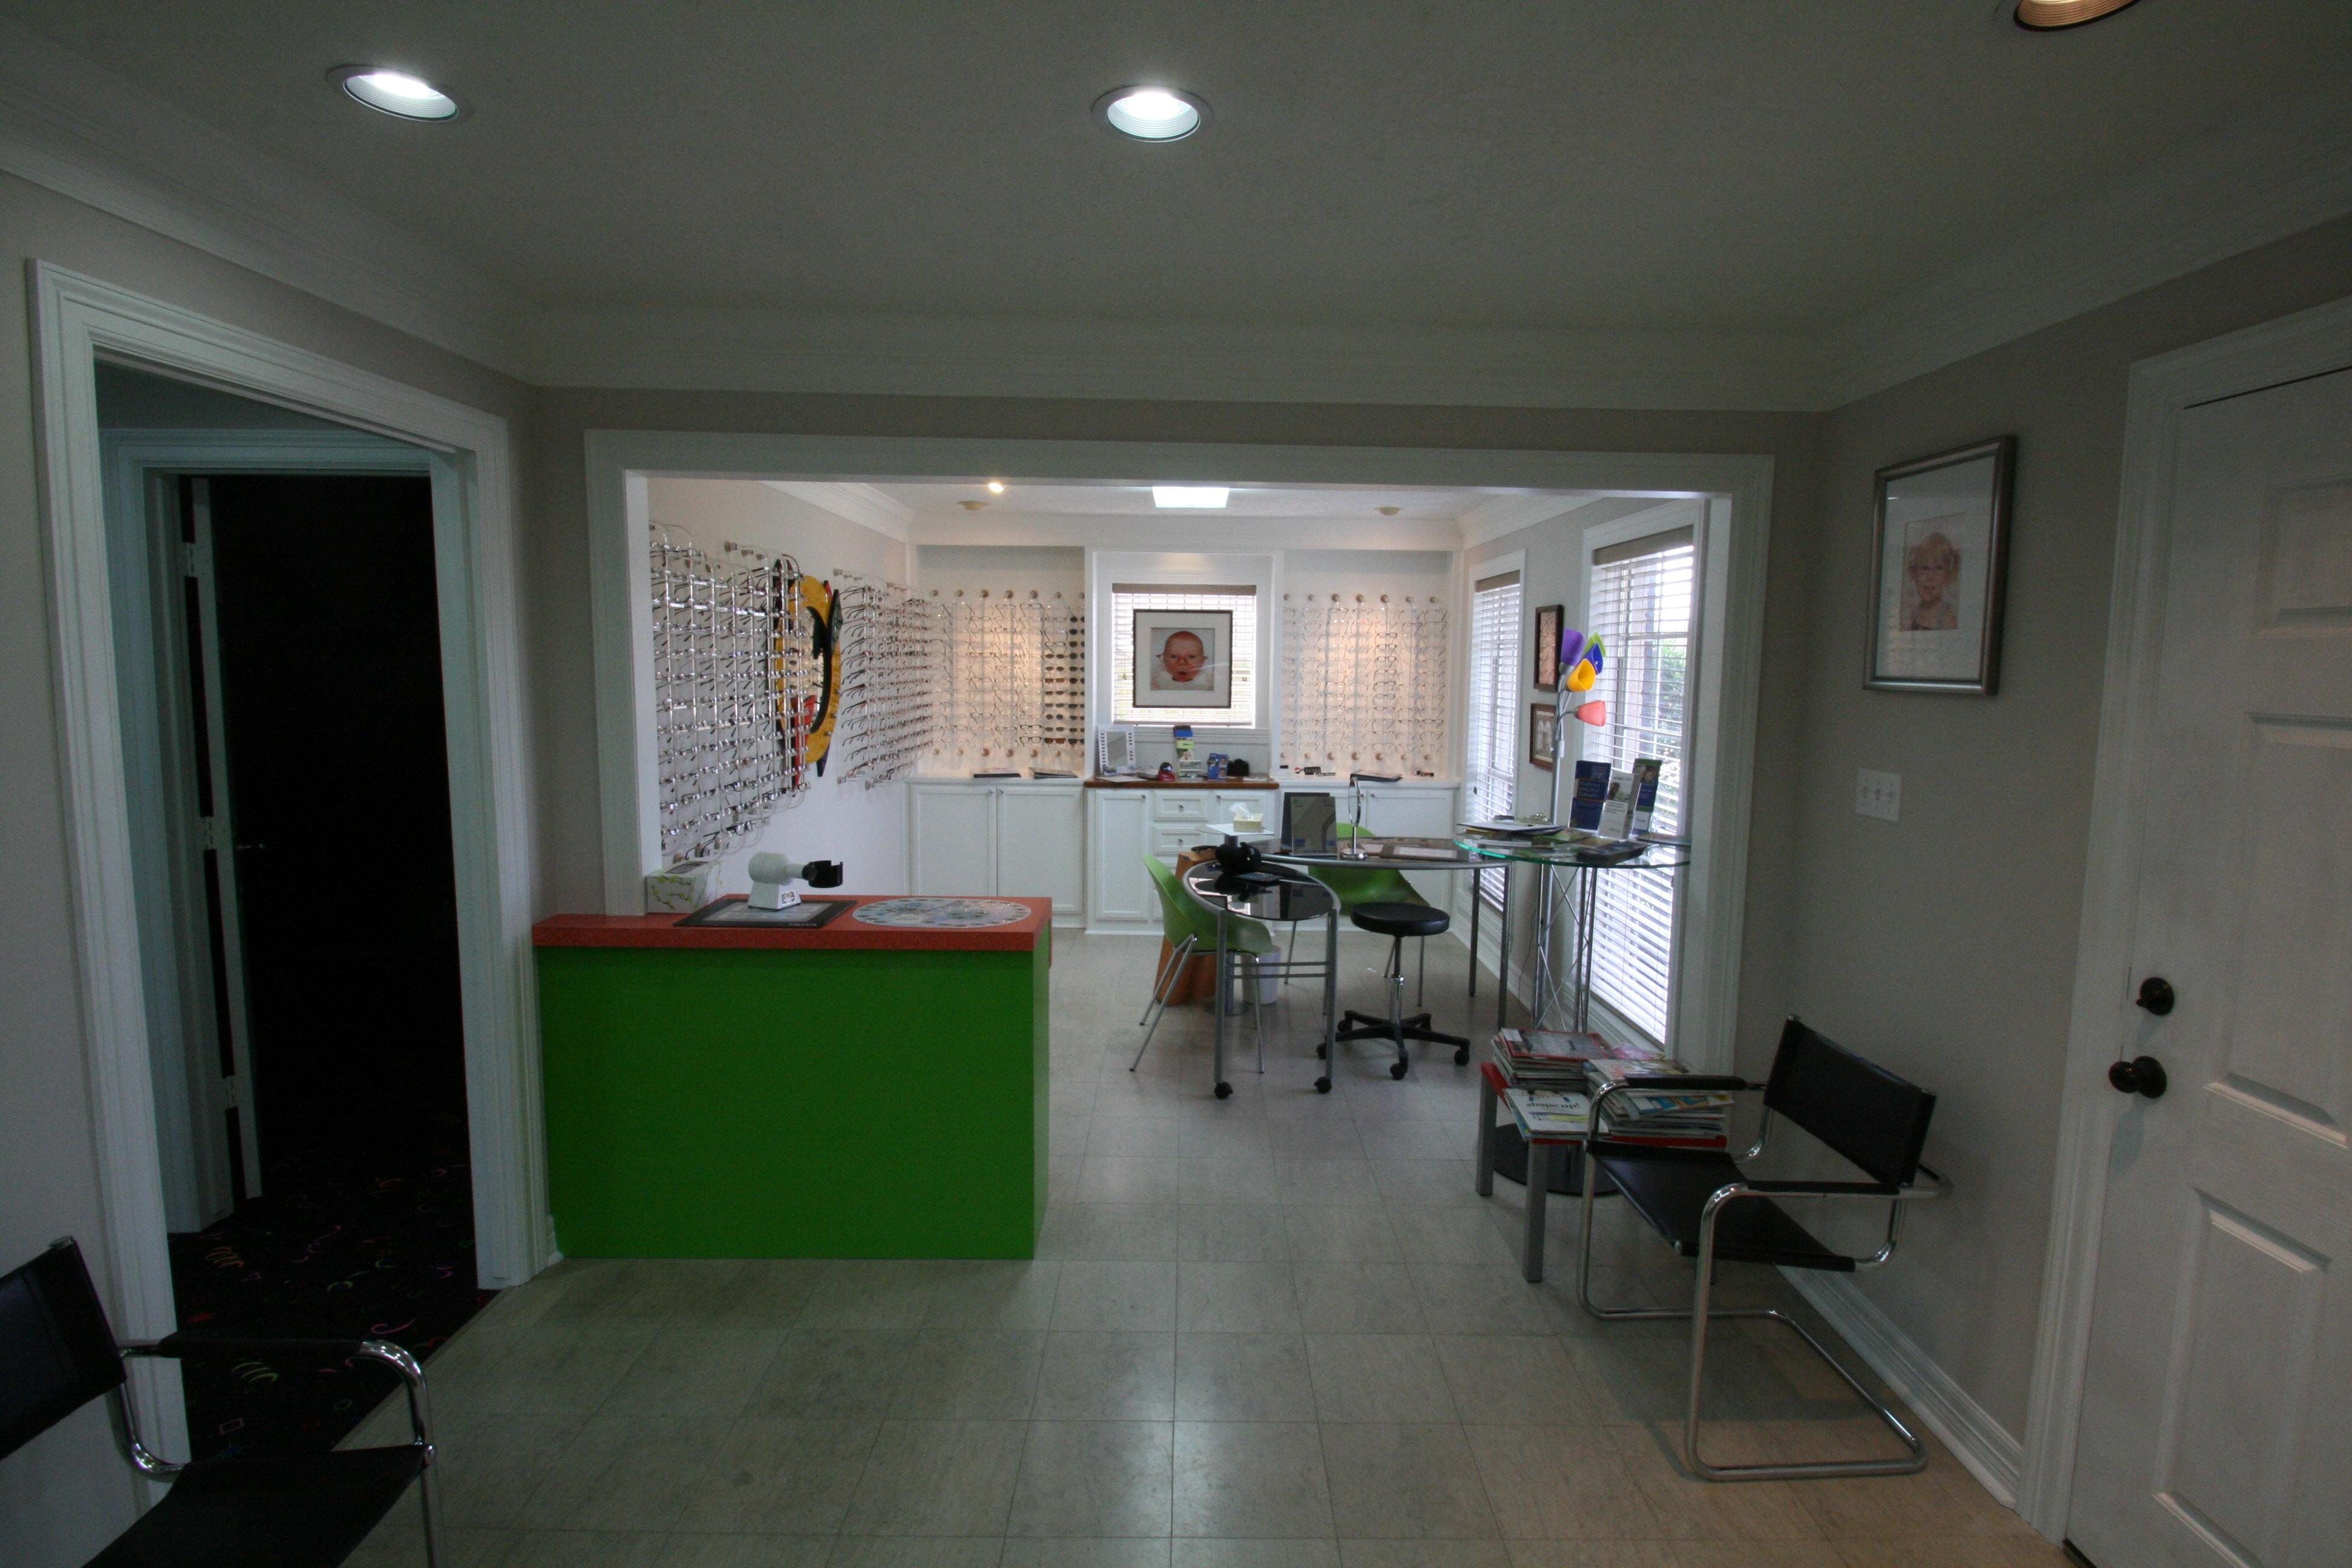 Beaumont interior img 0878